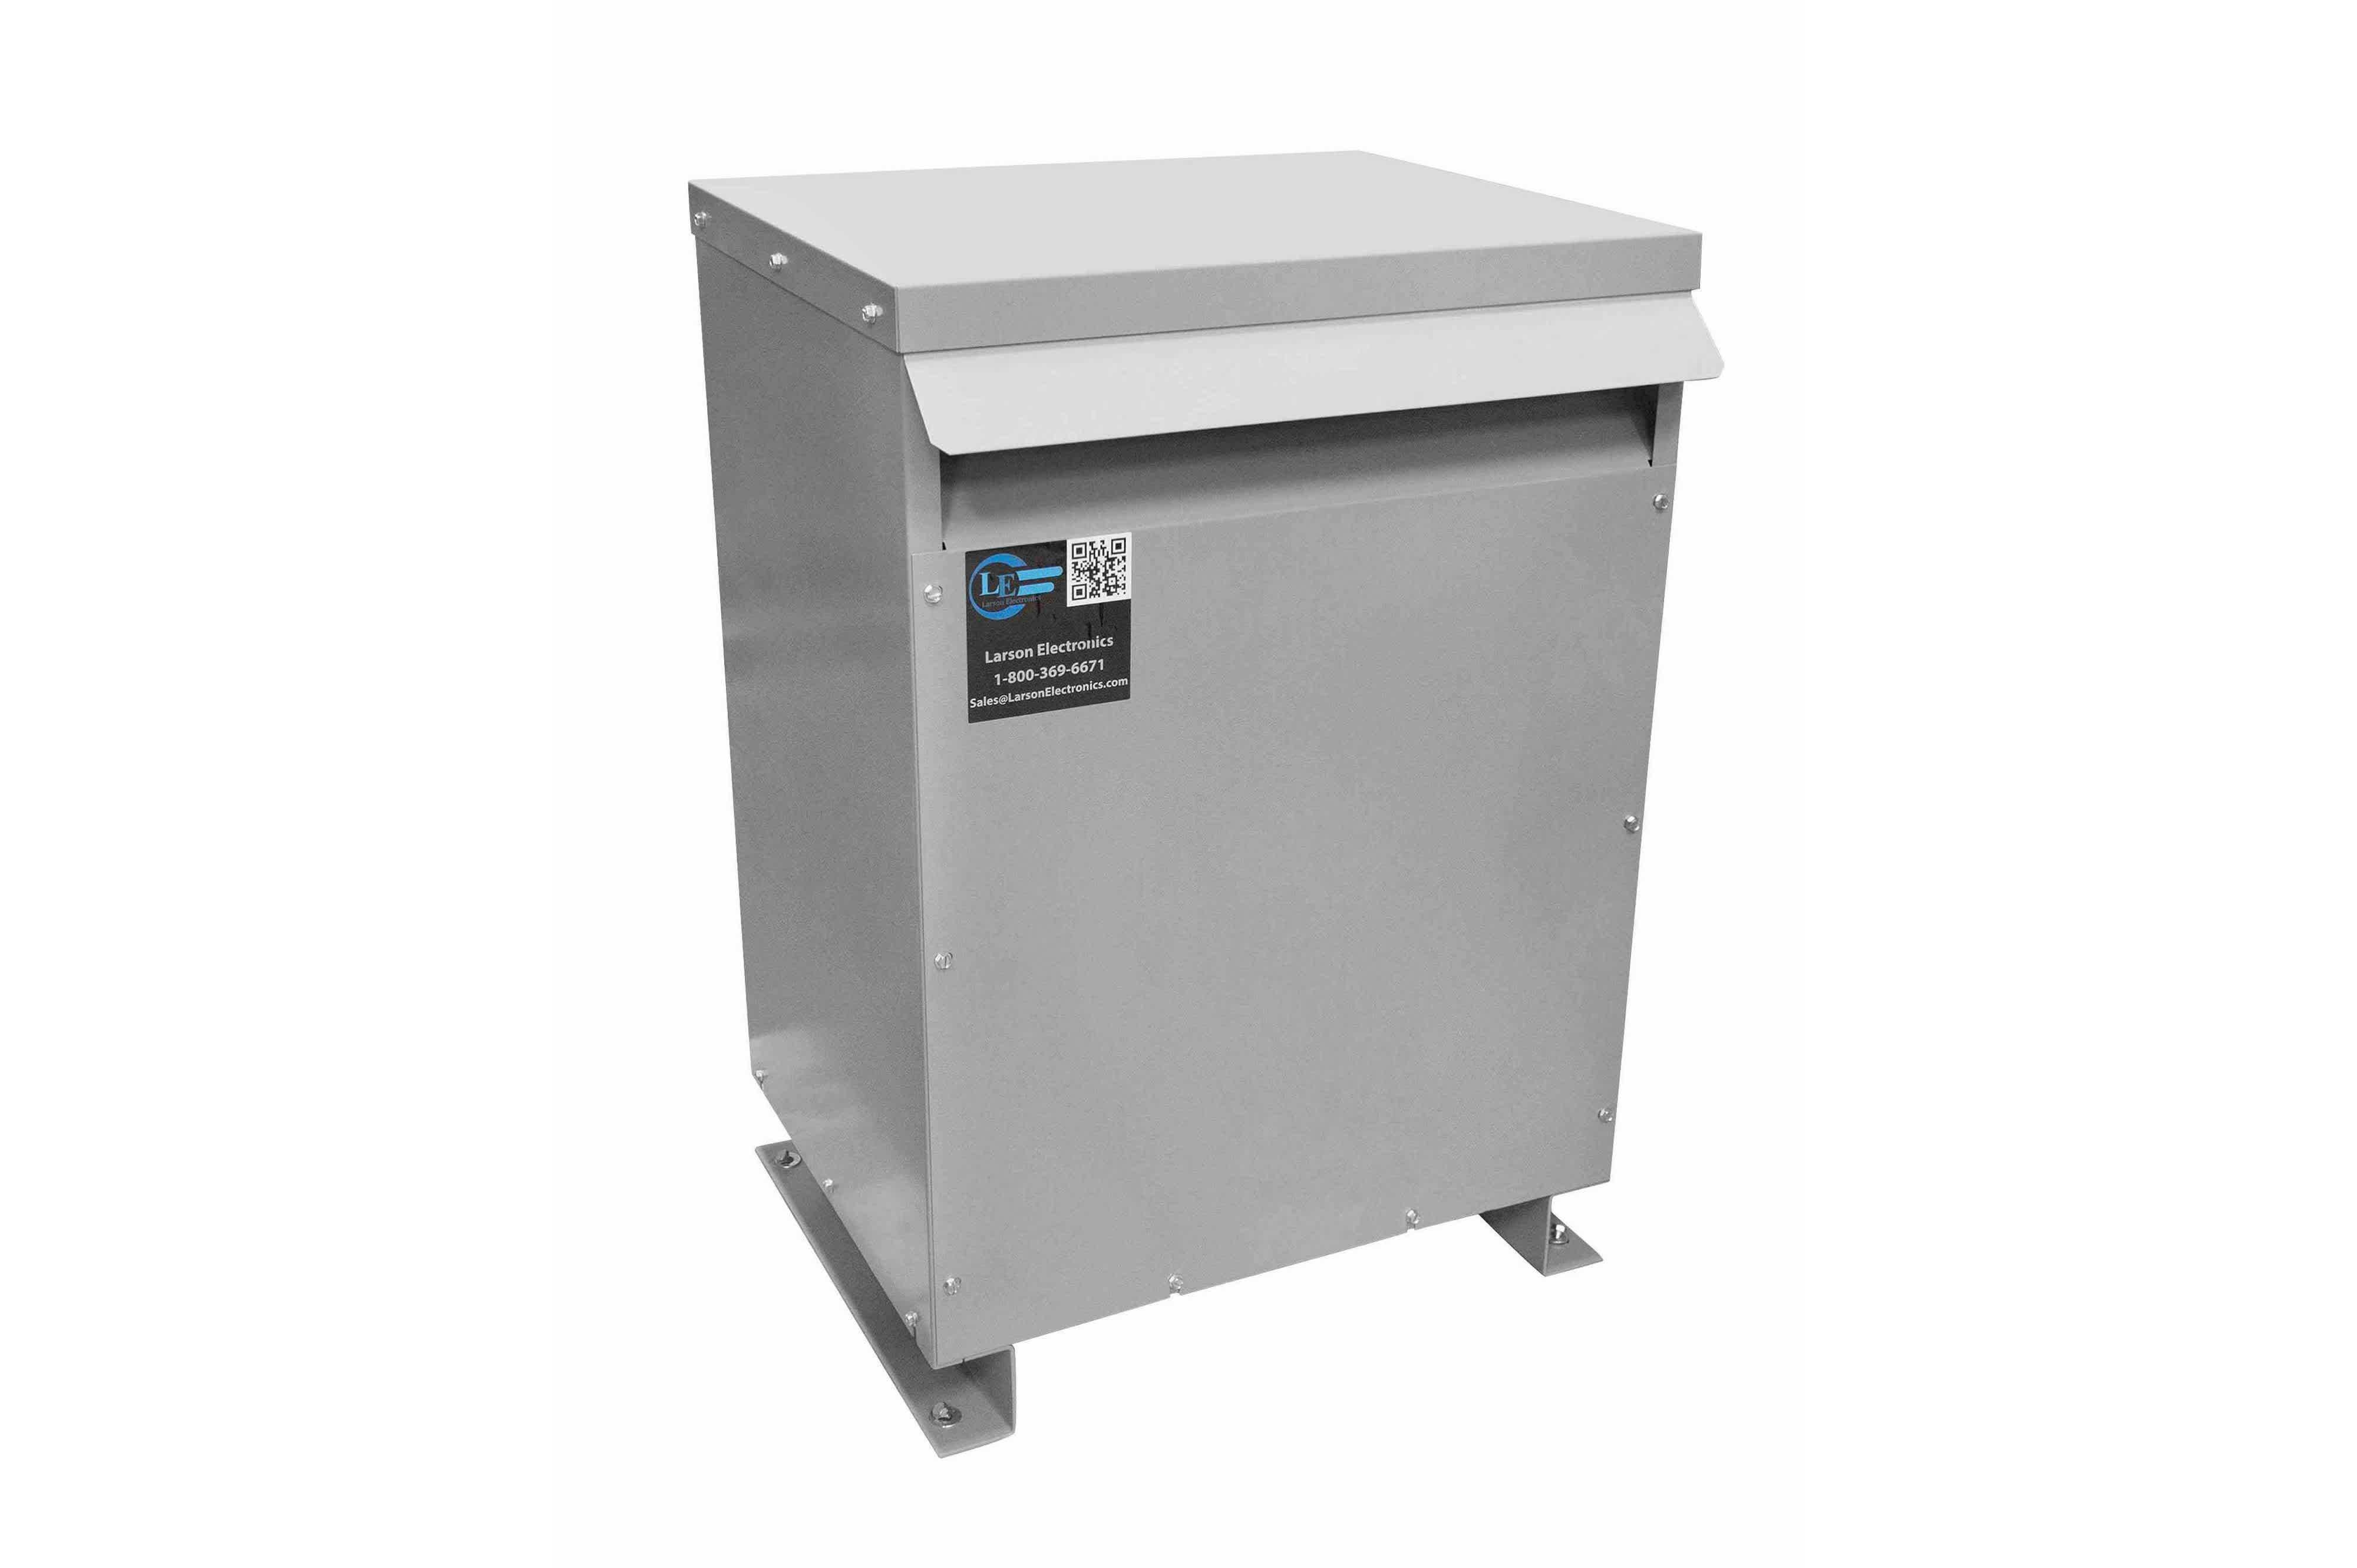 400 kVA 3PH DOE Transformer, 208V Delta Primary, 380Y/220 Wye-N Secondary, N3R, Ventilated, 60 Hz